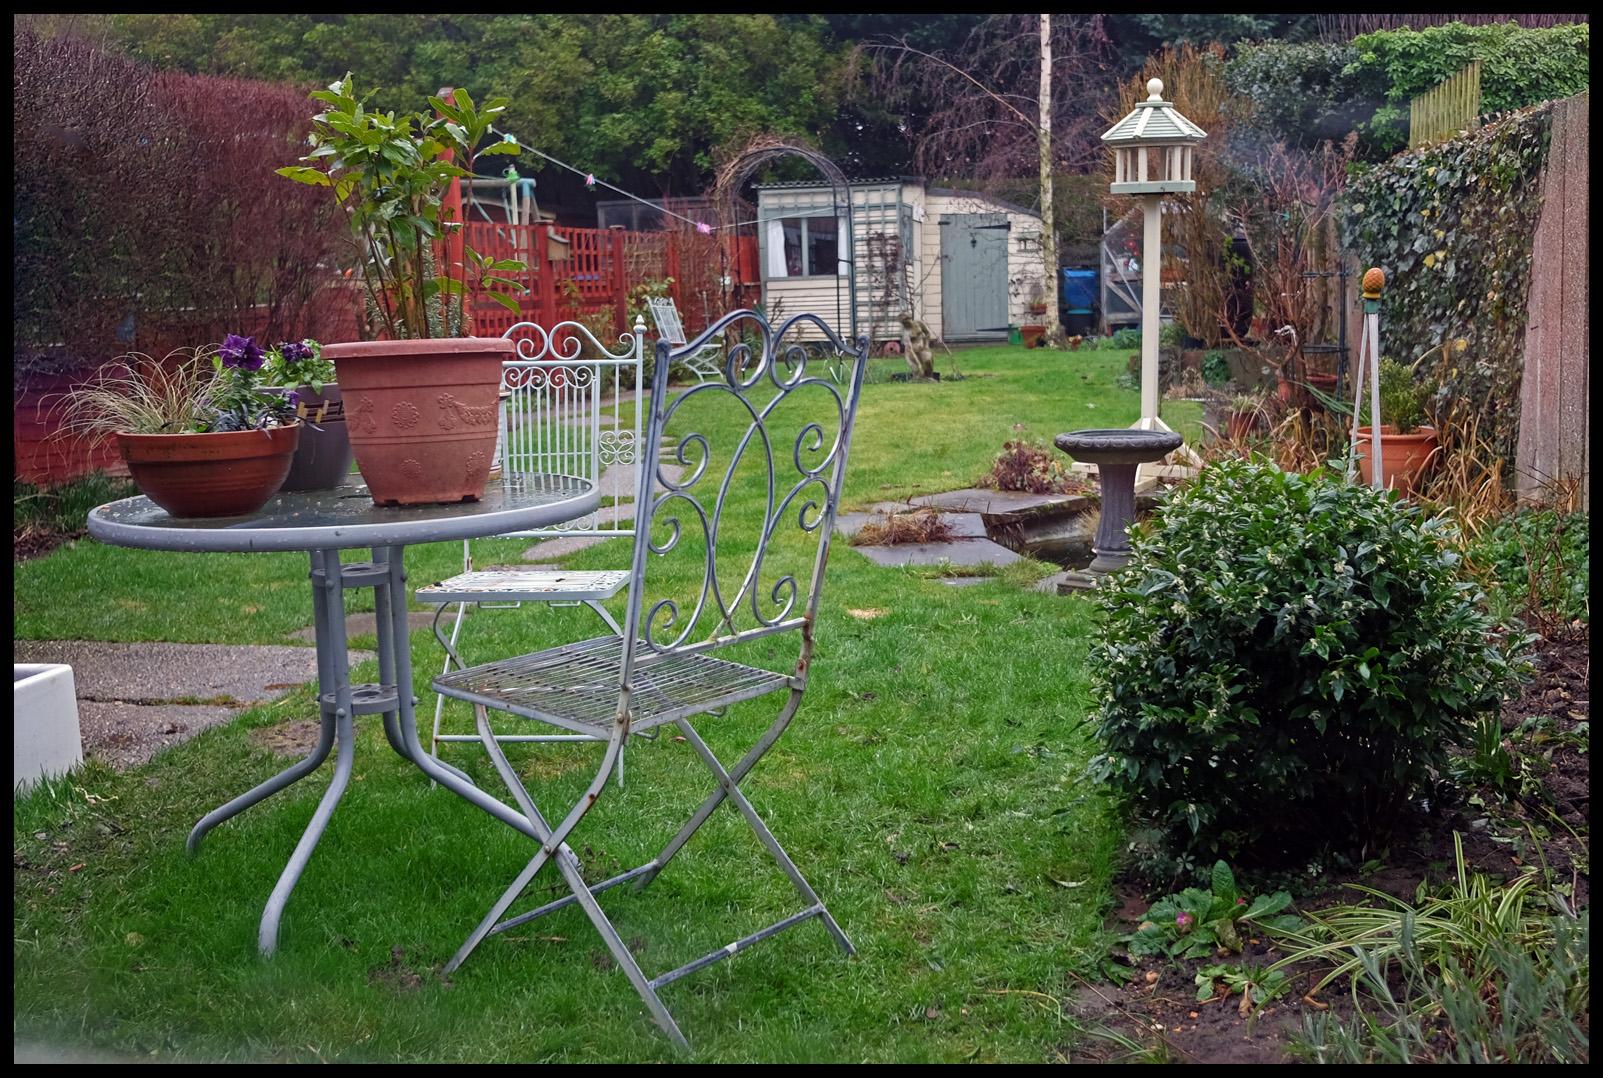 hintergrundbilder bume landschaft garten gras winter tabelle haus sessel struche zaun bogen gehweg hinterhof baum pflanze vogel - Hinterhof Landschaften Bilder